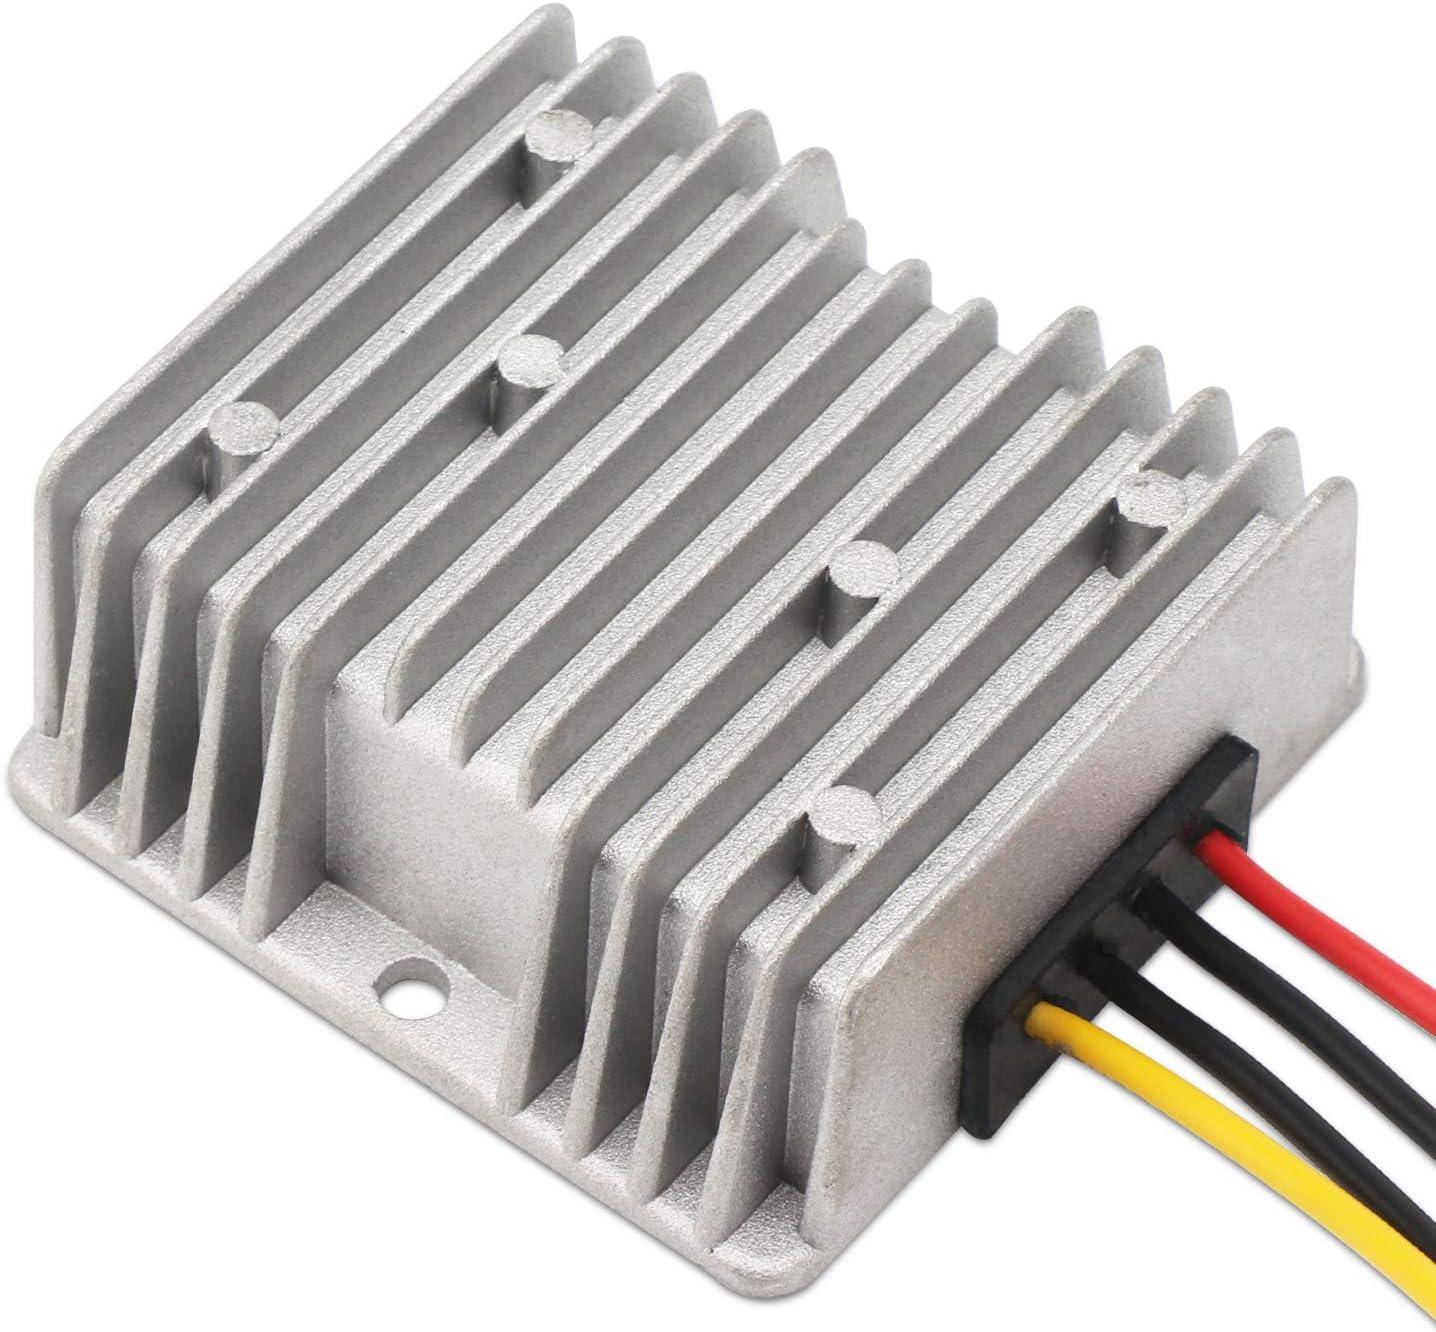 Down Voltage Regulator DROK Car Power Supply Step-Down Module DC 20-55V to DC 12V 10A 120W Waterproof Buck Converter Volt Transformer Reducer Board